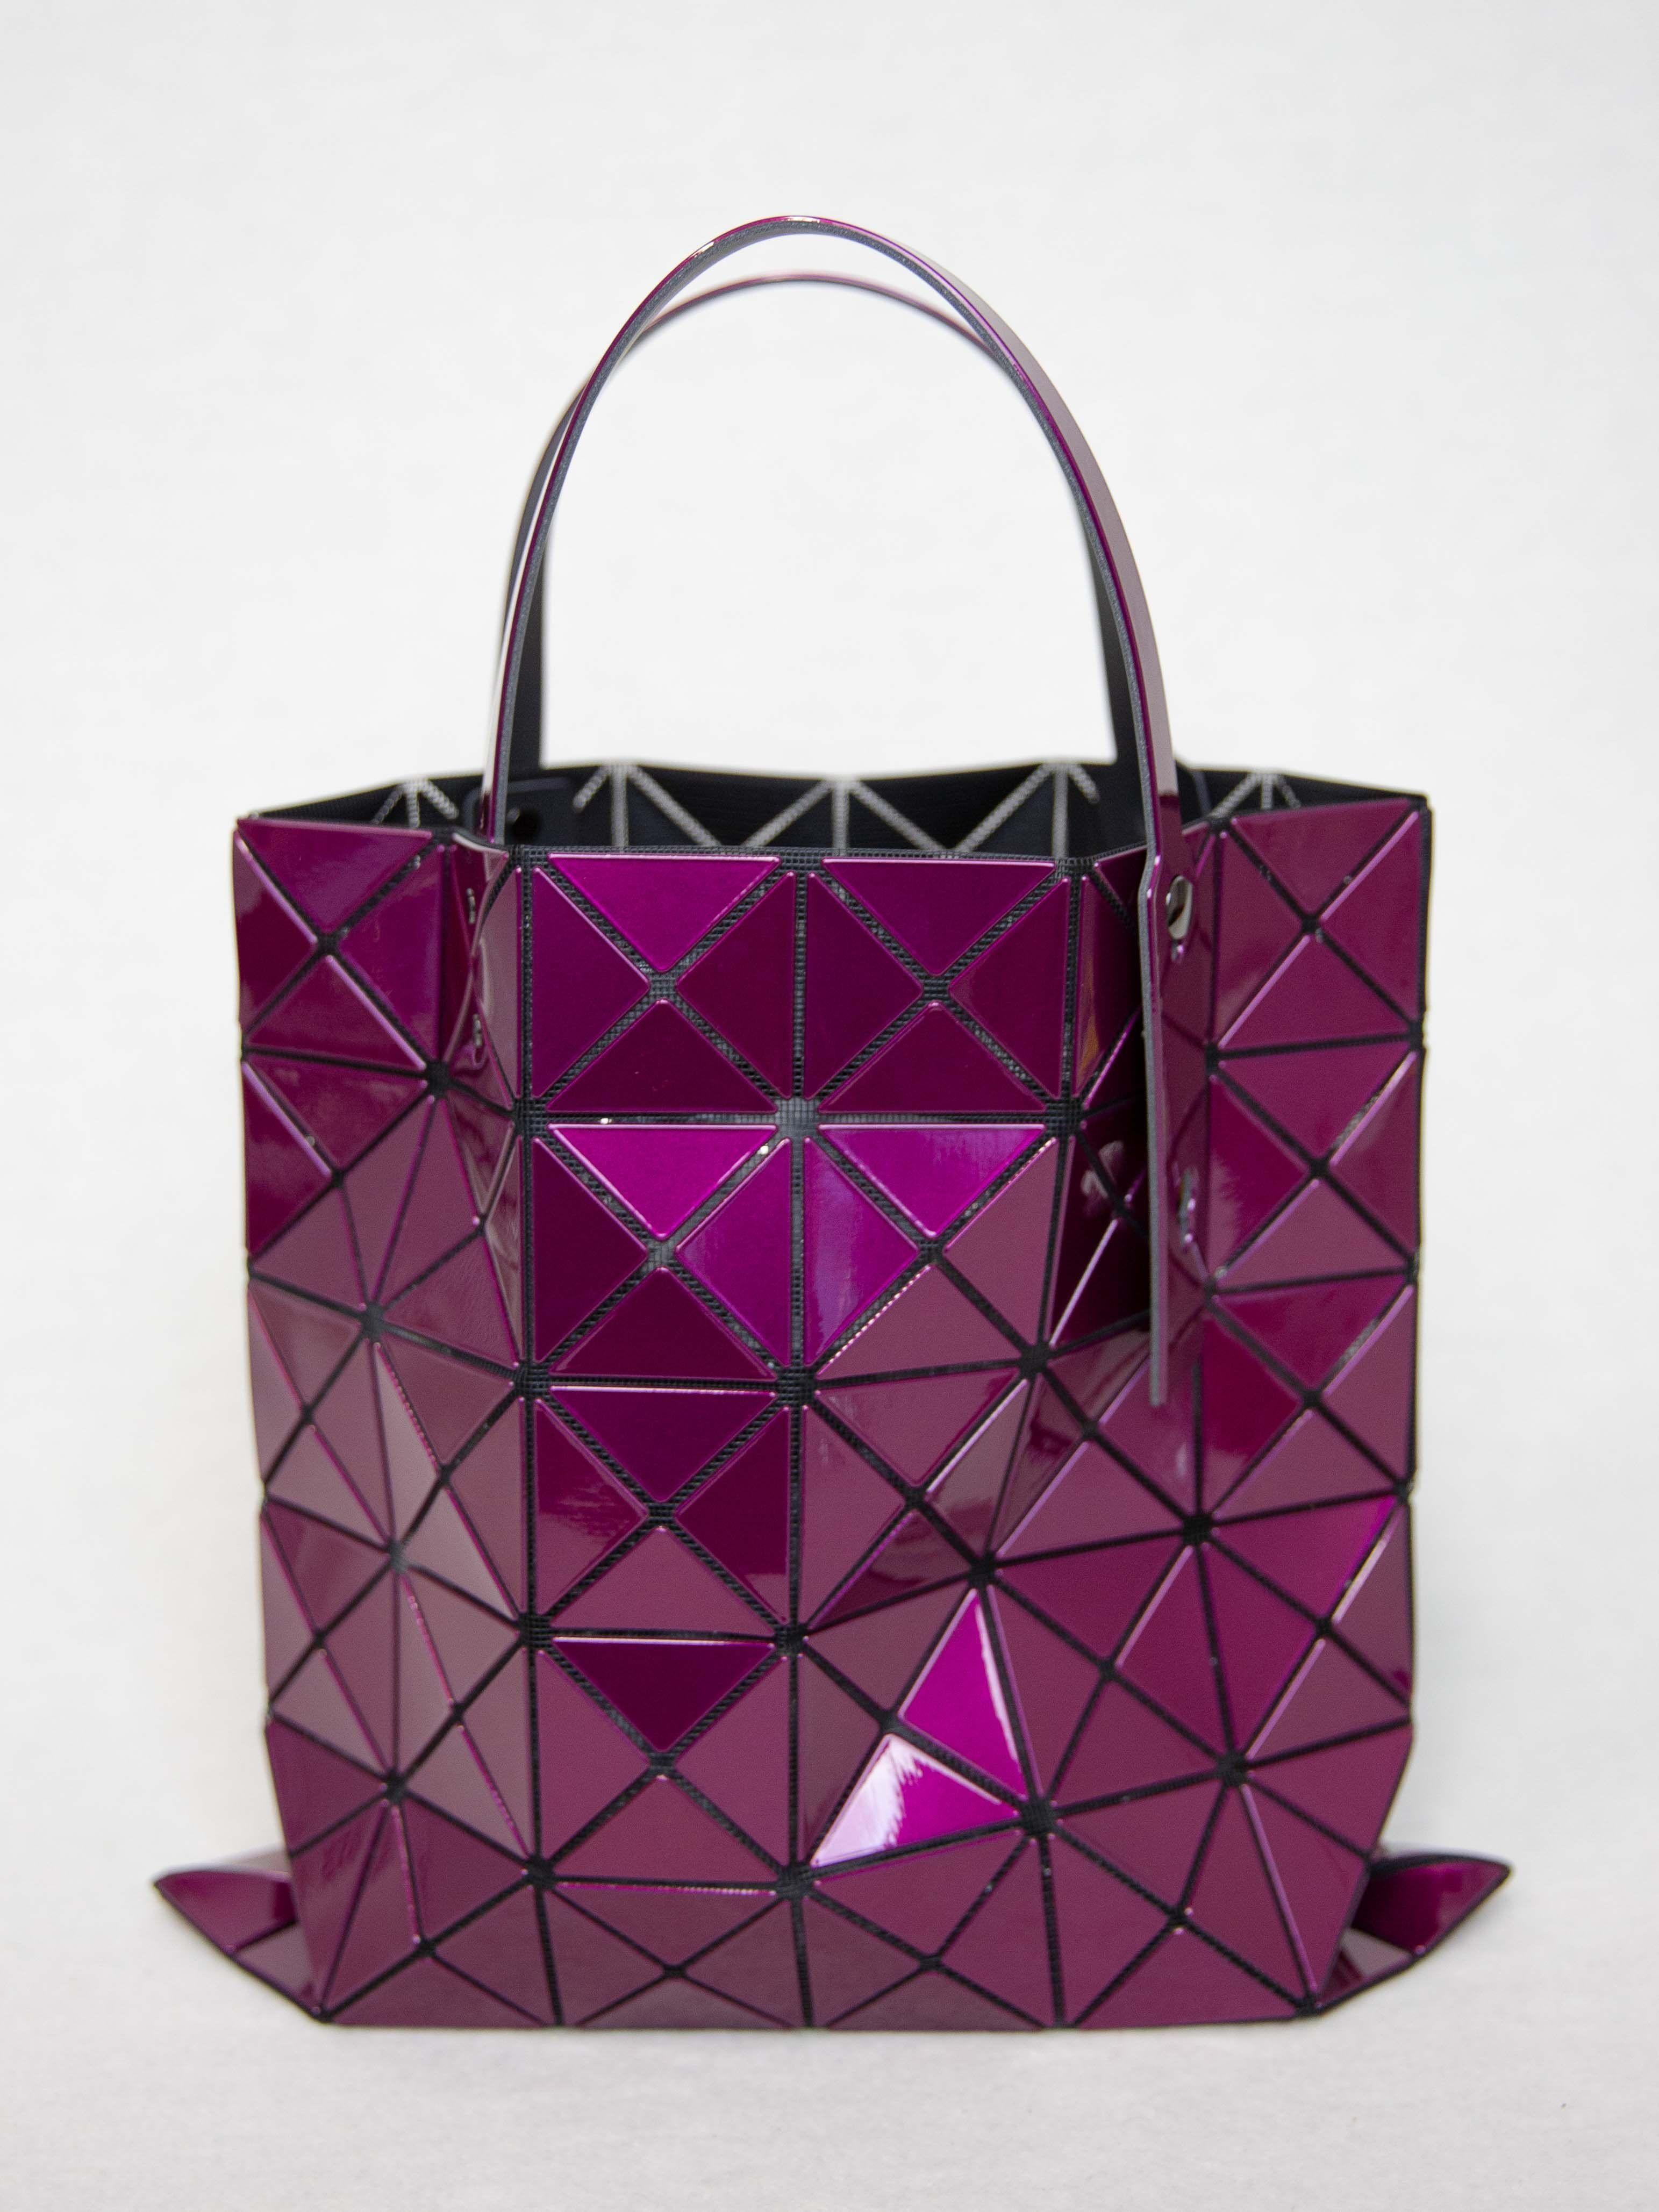 5c8fd6dbbb4c BAO BAO ISSEY MIYAKE Lucent Metallic Tote Bag - Bordeaux